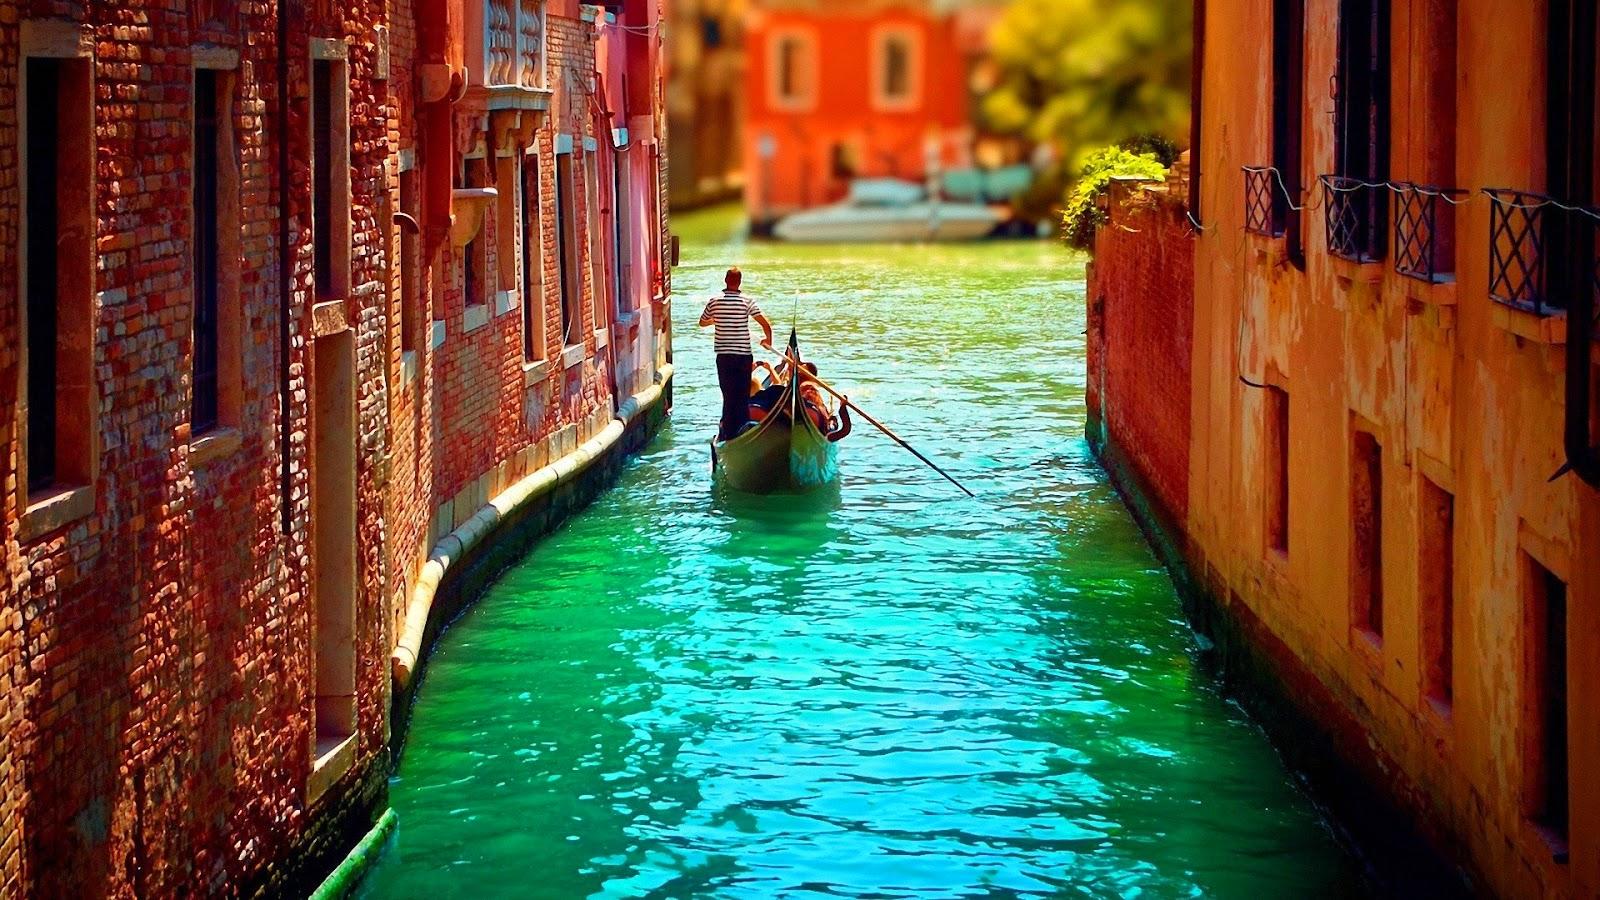 Venice Italy wallpaper